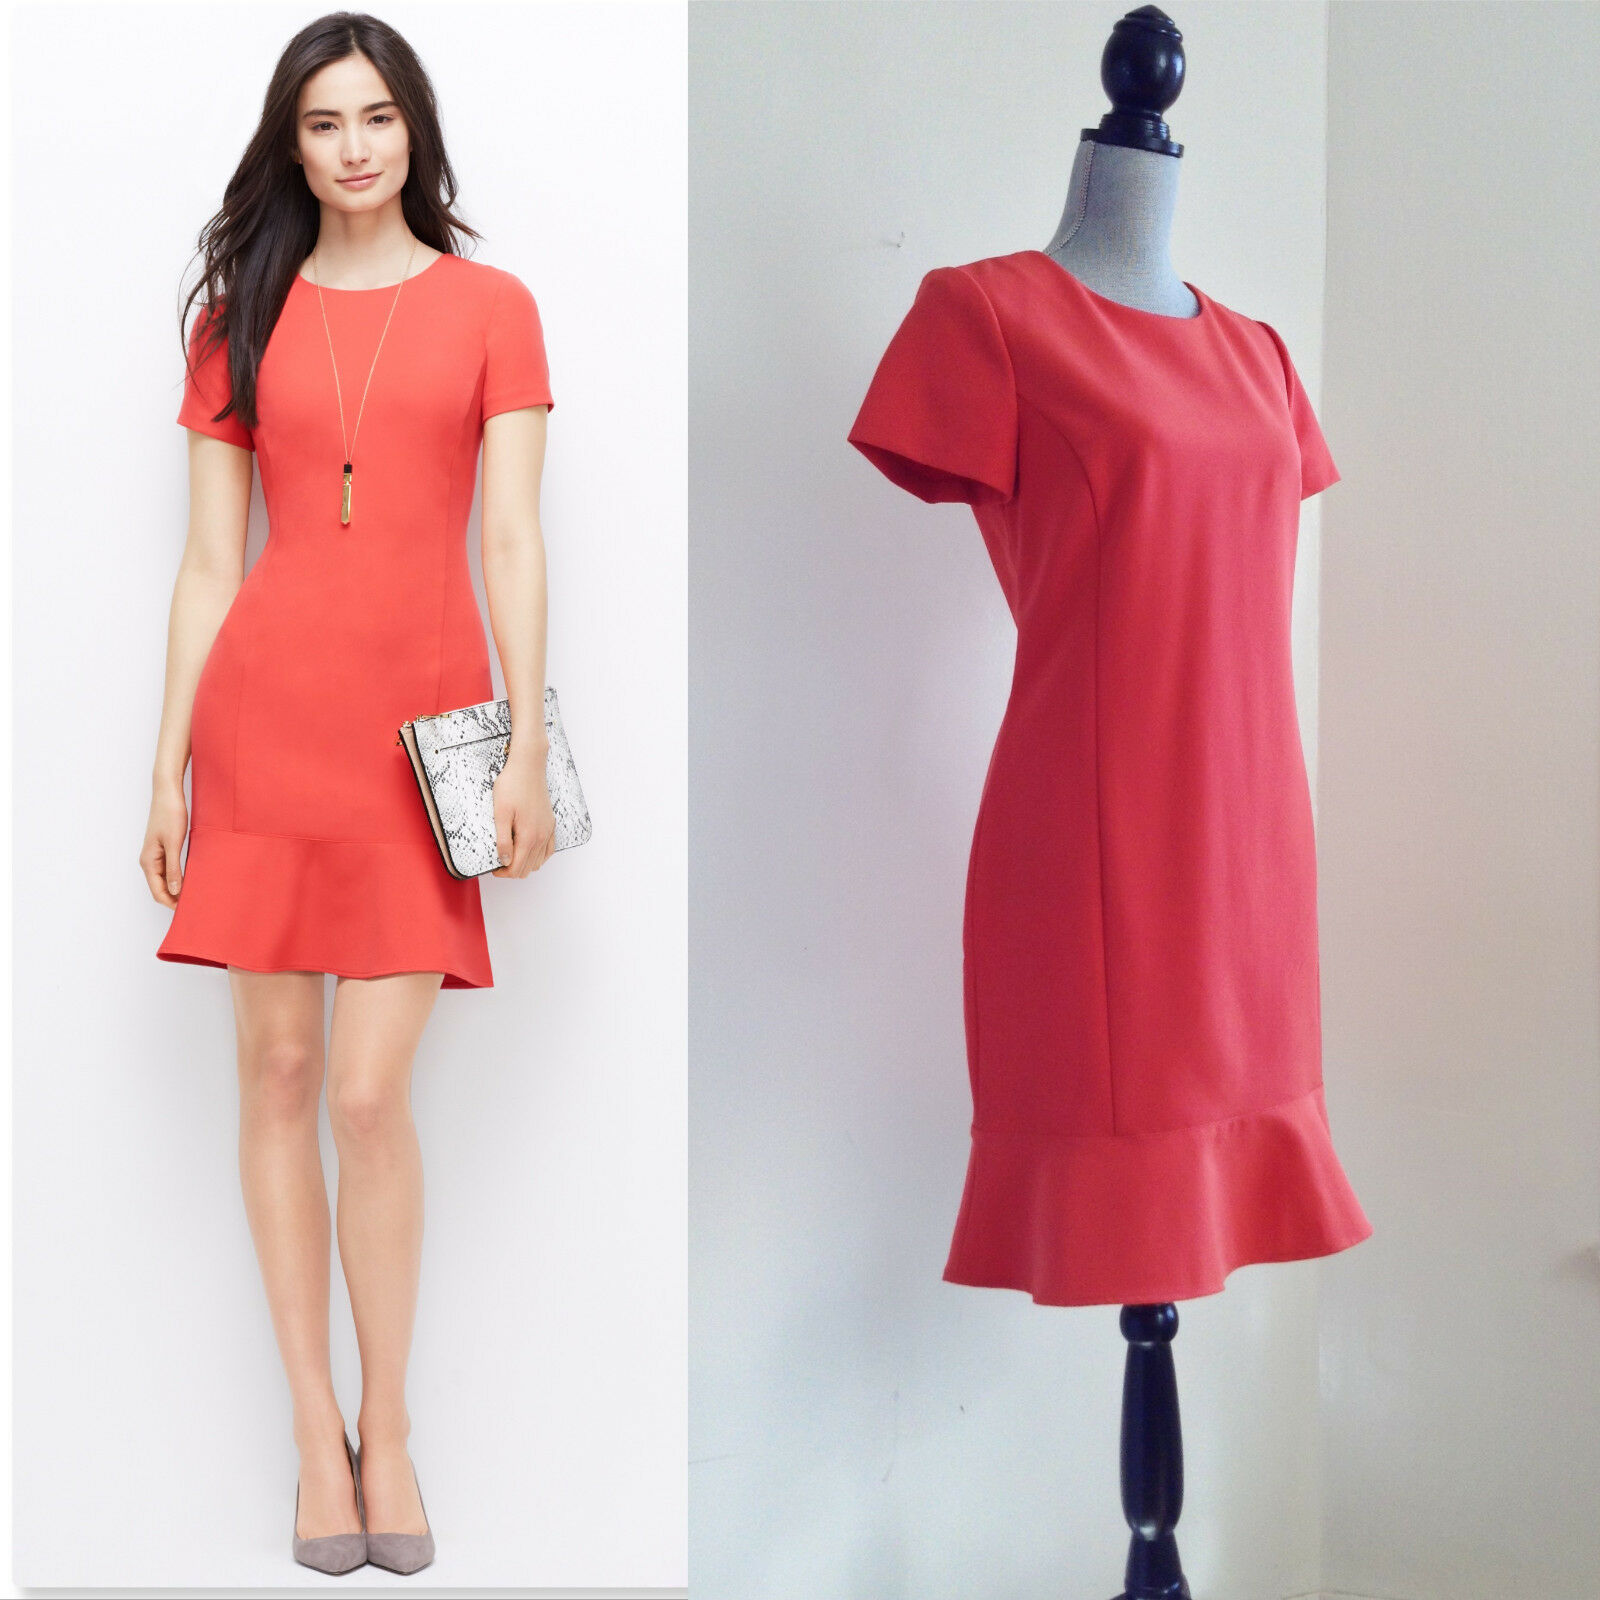 NWT Ann Taylor Flouce Hem Dress Coral Pink Sheath Pencil Coral Pink Sz 10 M